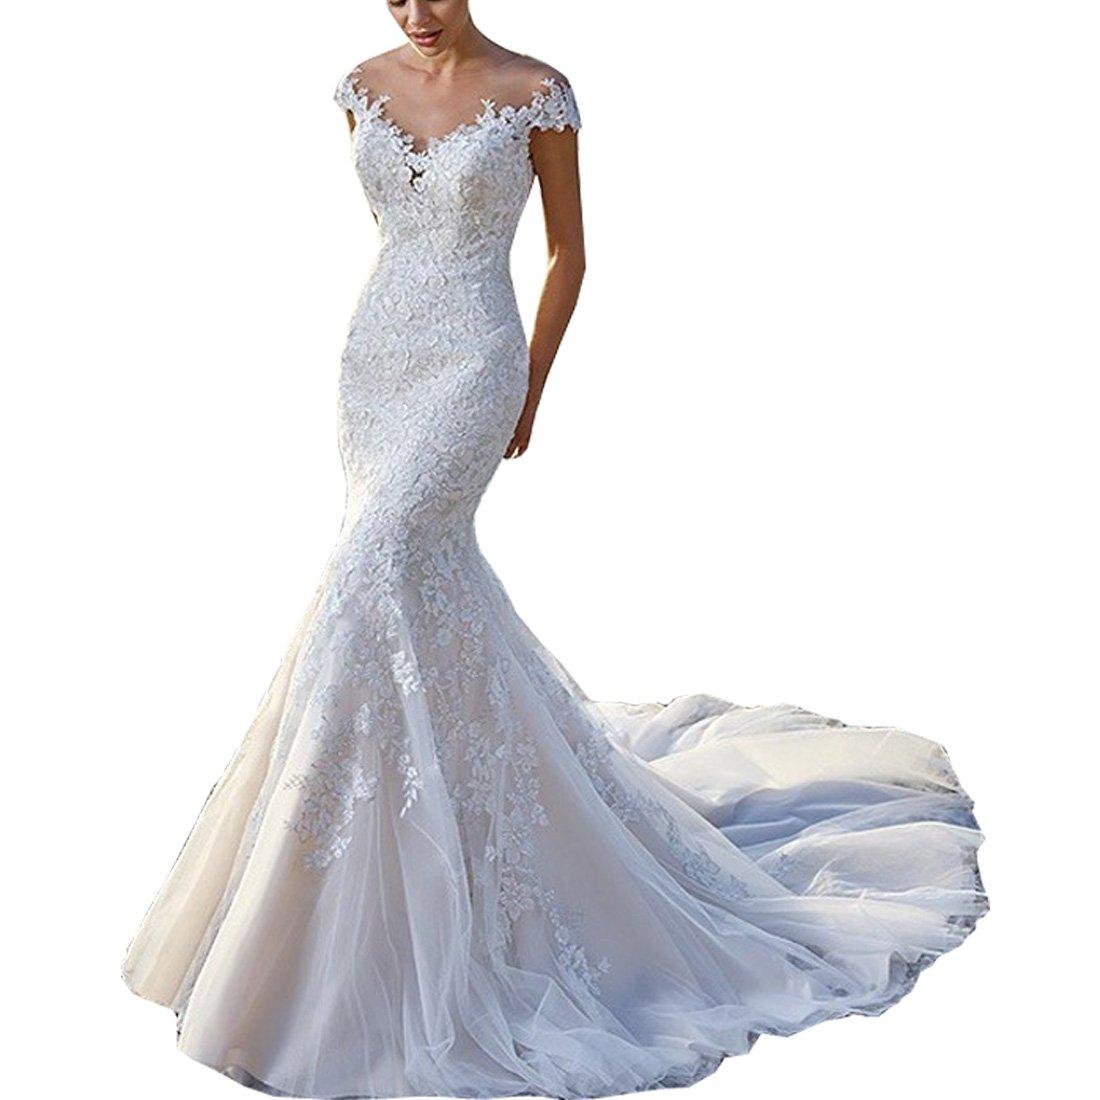 Thrsaeyi Romanticdresses Beautiful Muslim Wedding Dresses Lace Long